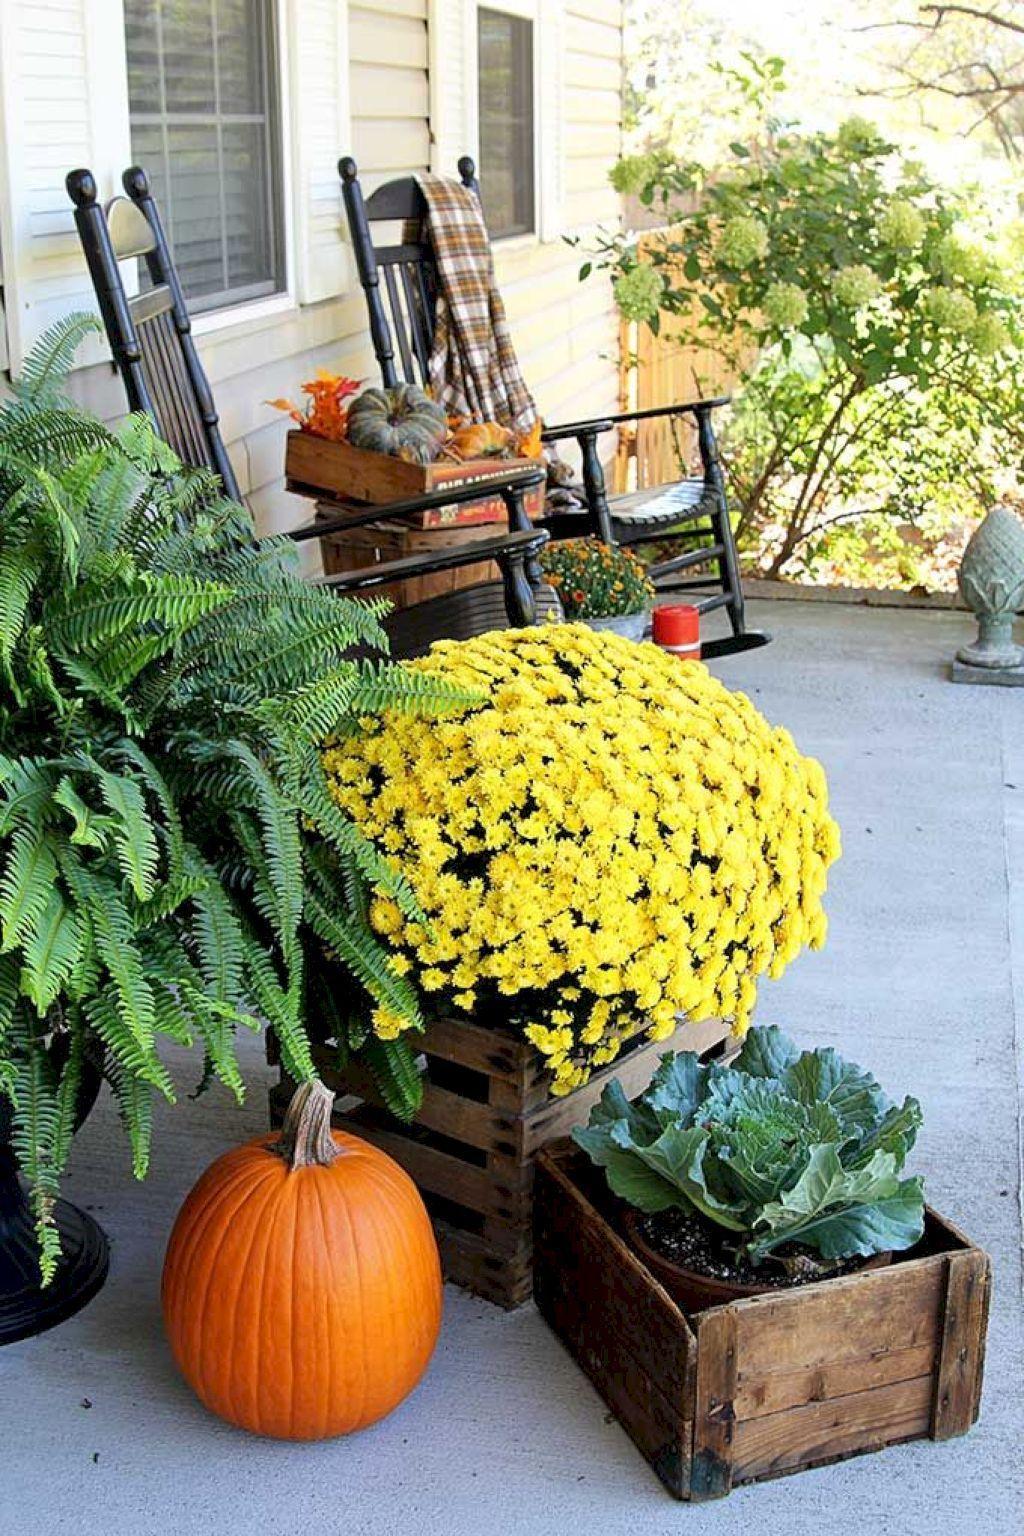 Stunning Fall Porch Decor Ideas On A Budget 61 Fall Front Porch Decor Fall Decorations Porch Front Porch Decorating